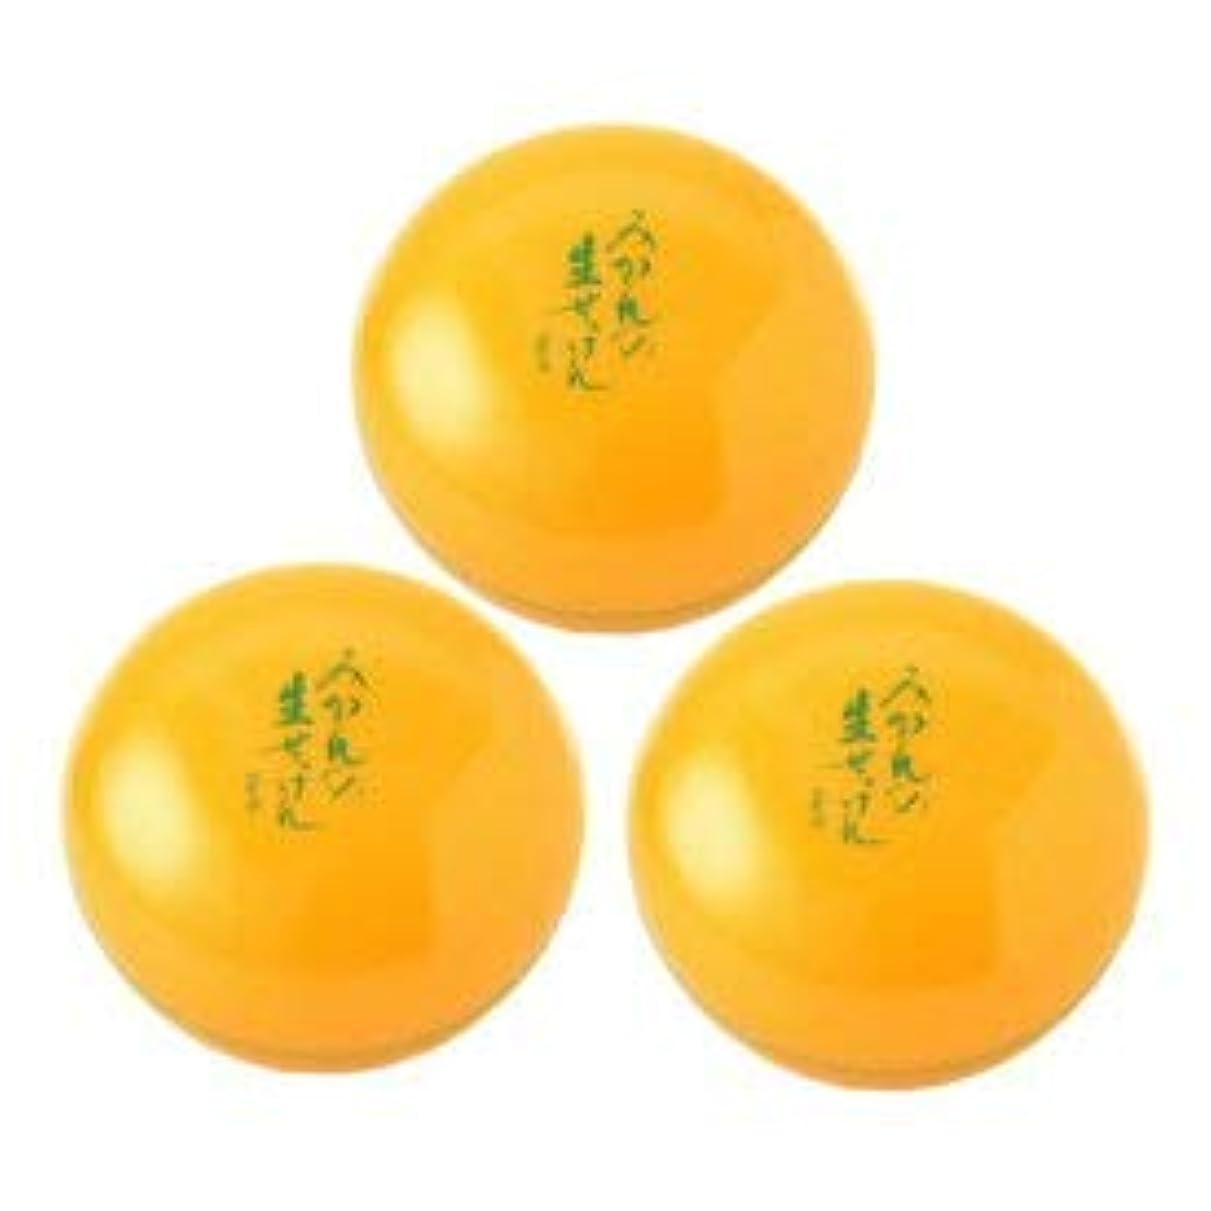 UYEKI美香柑みかんの生せっけん50g×3個セット